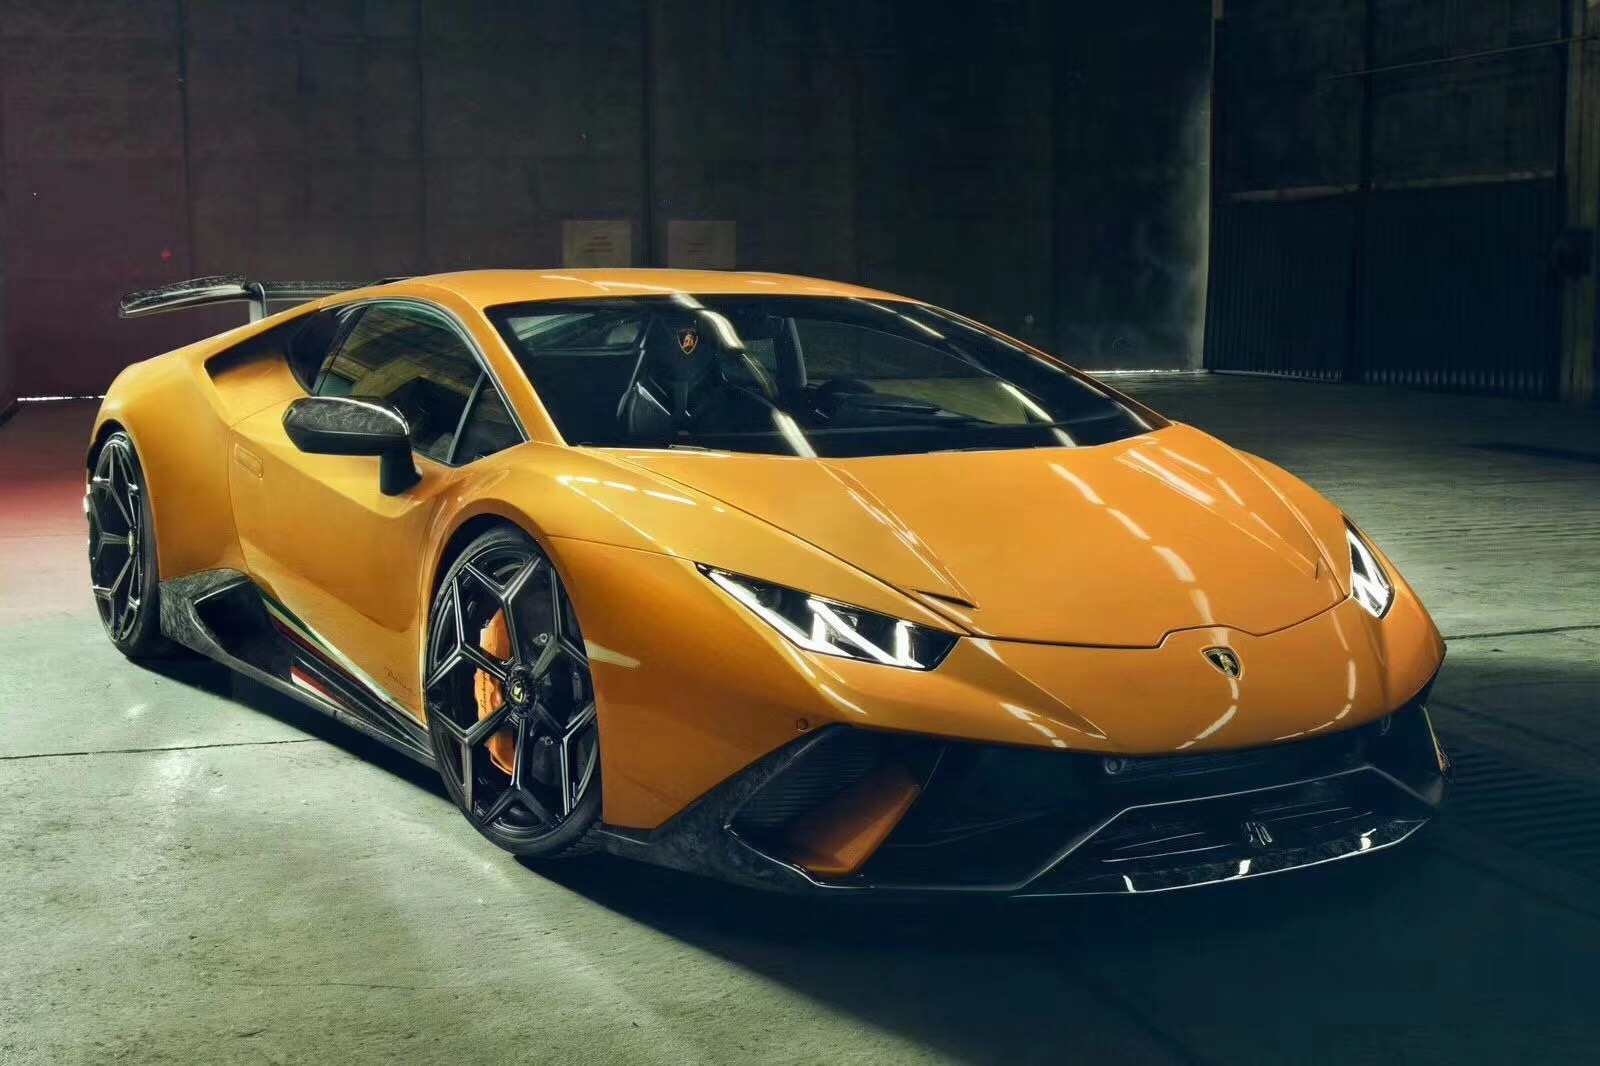 Lamborghini580/610 Lp640 performance body kit  front bumper rear bumper side skirts spoiler